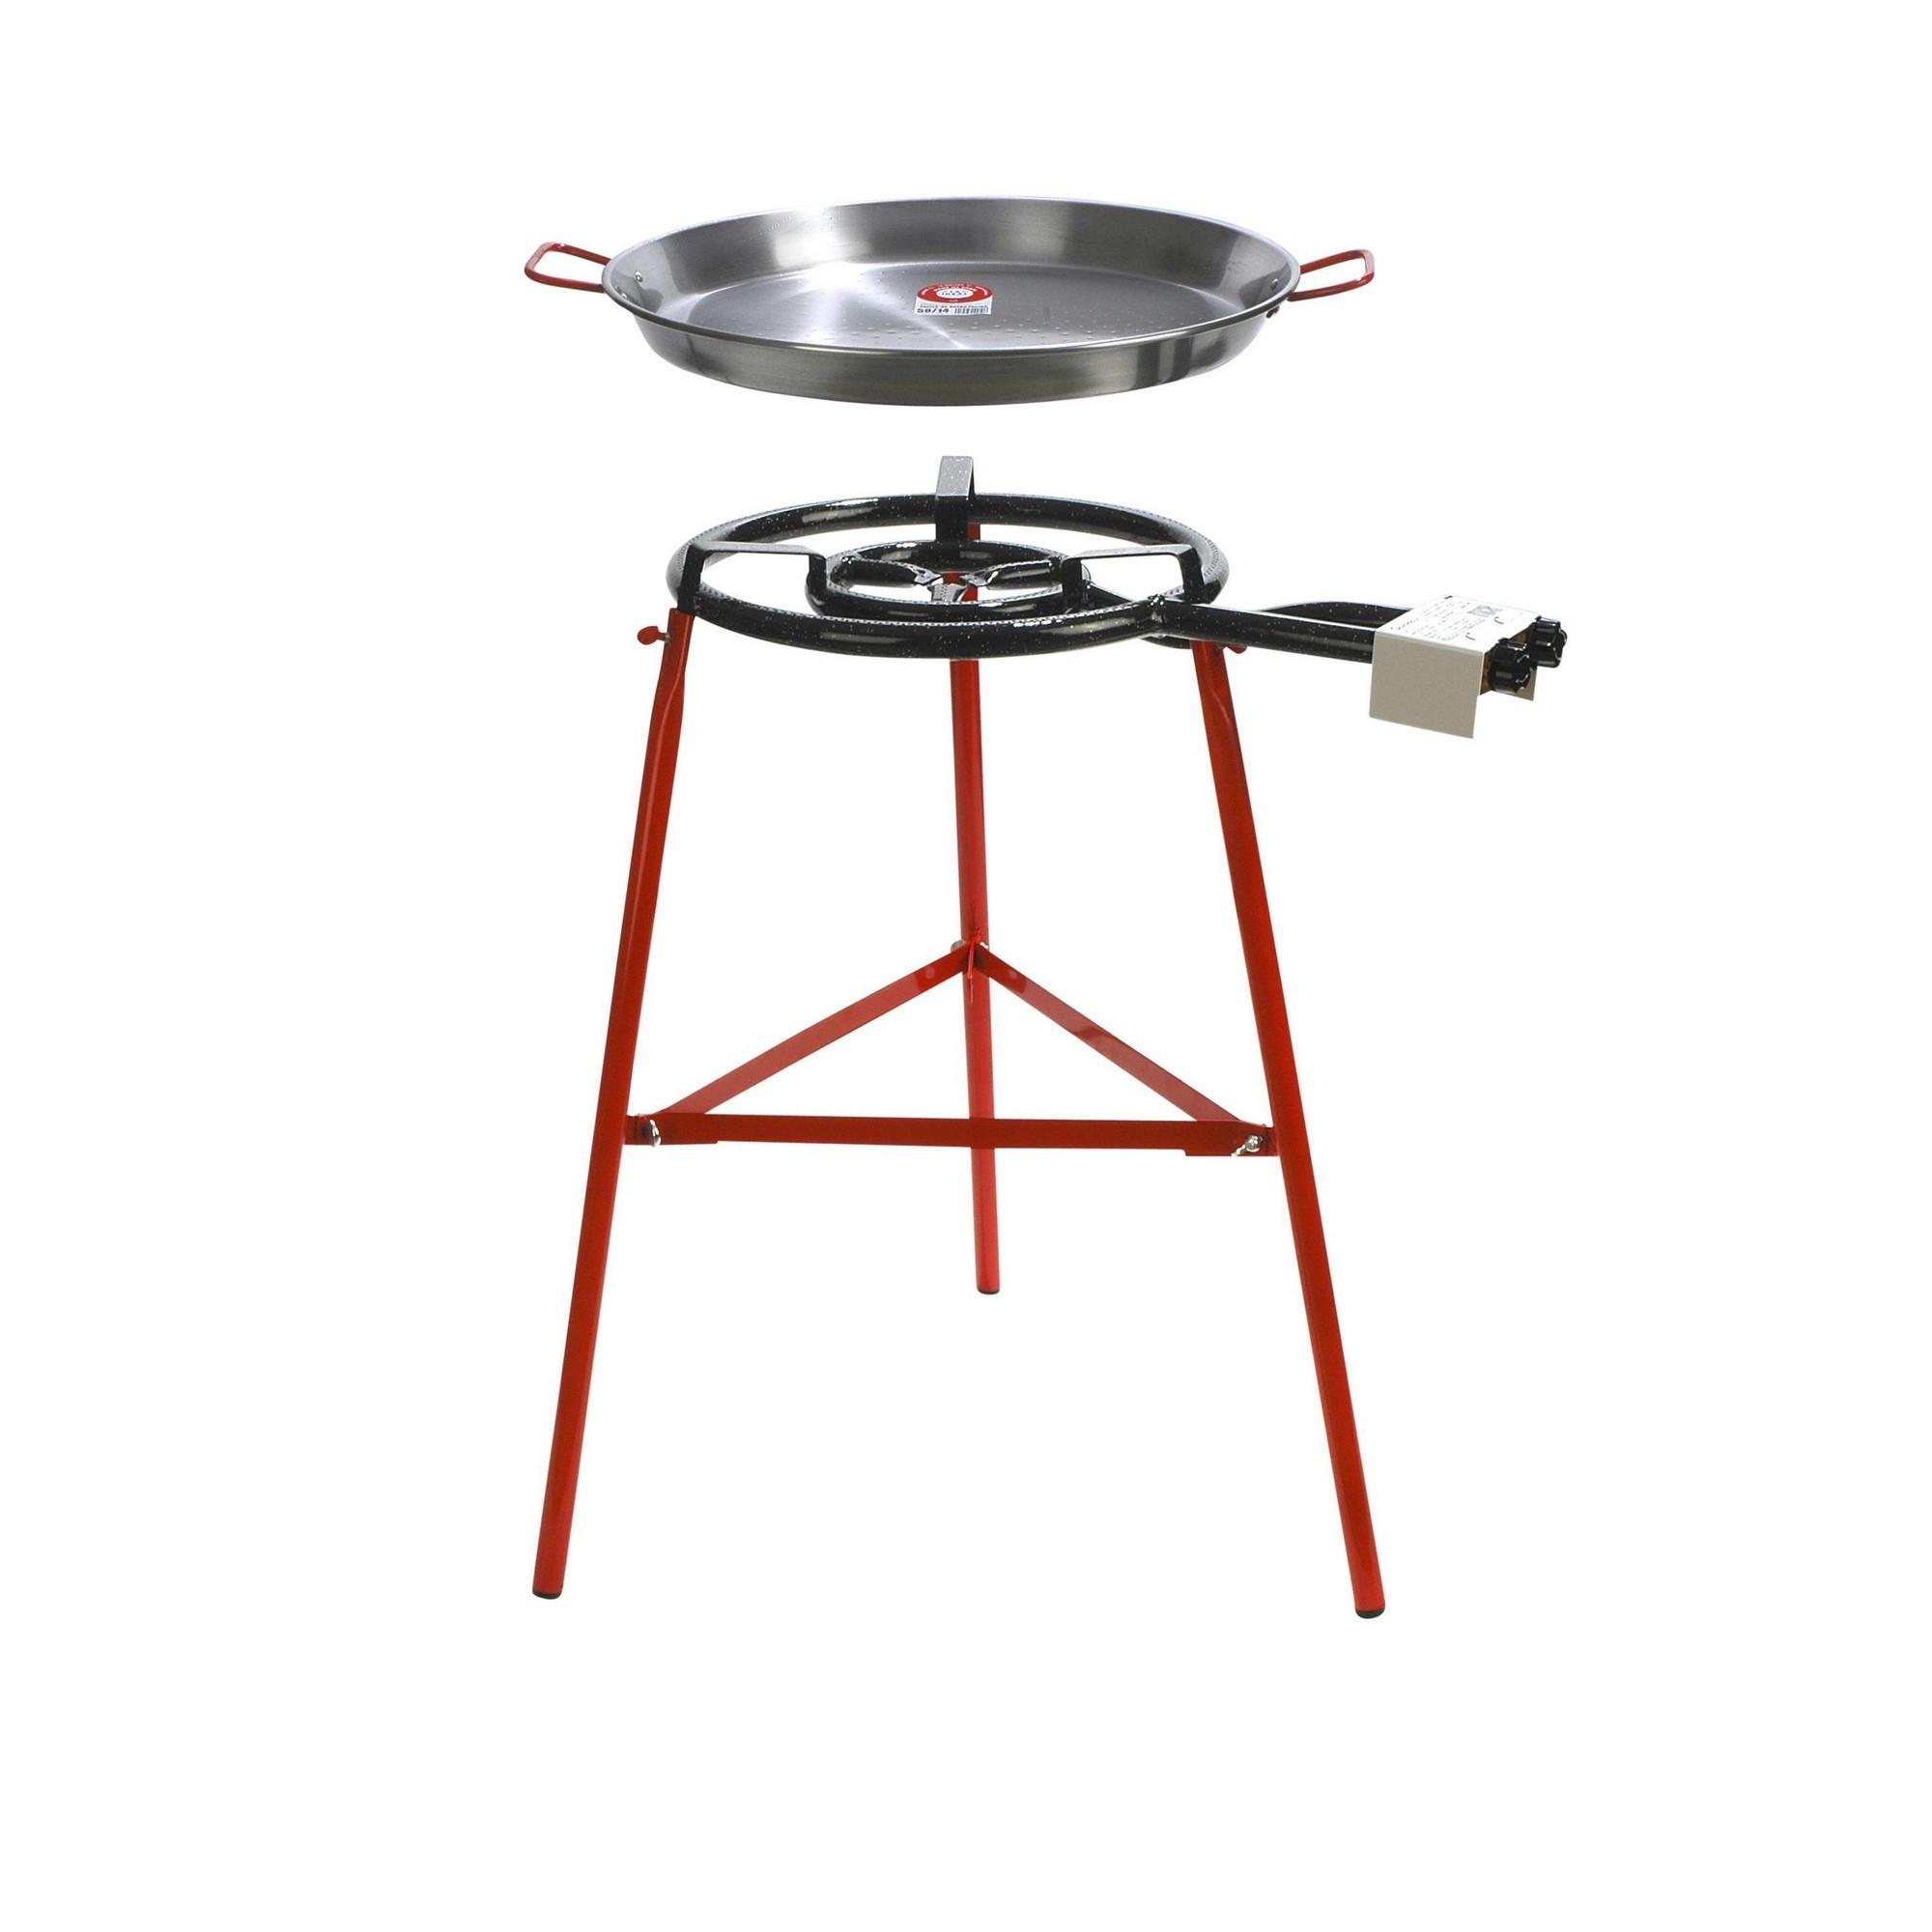 Garcima Tarbarca Paella Gas Burner Set